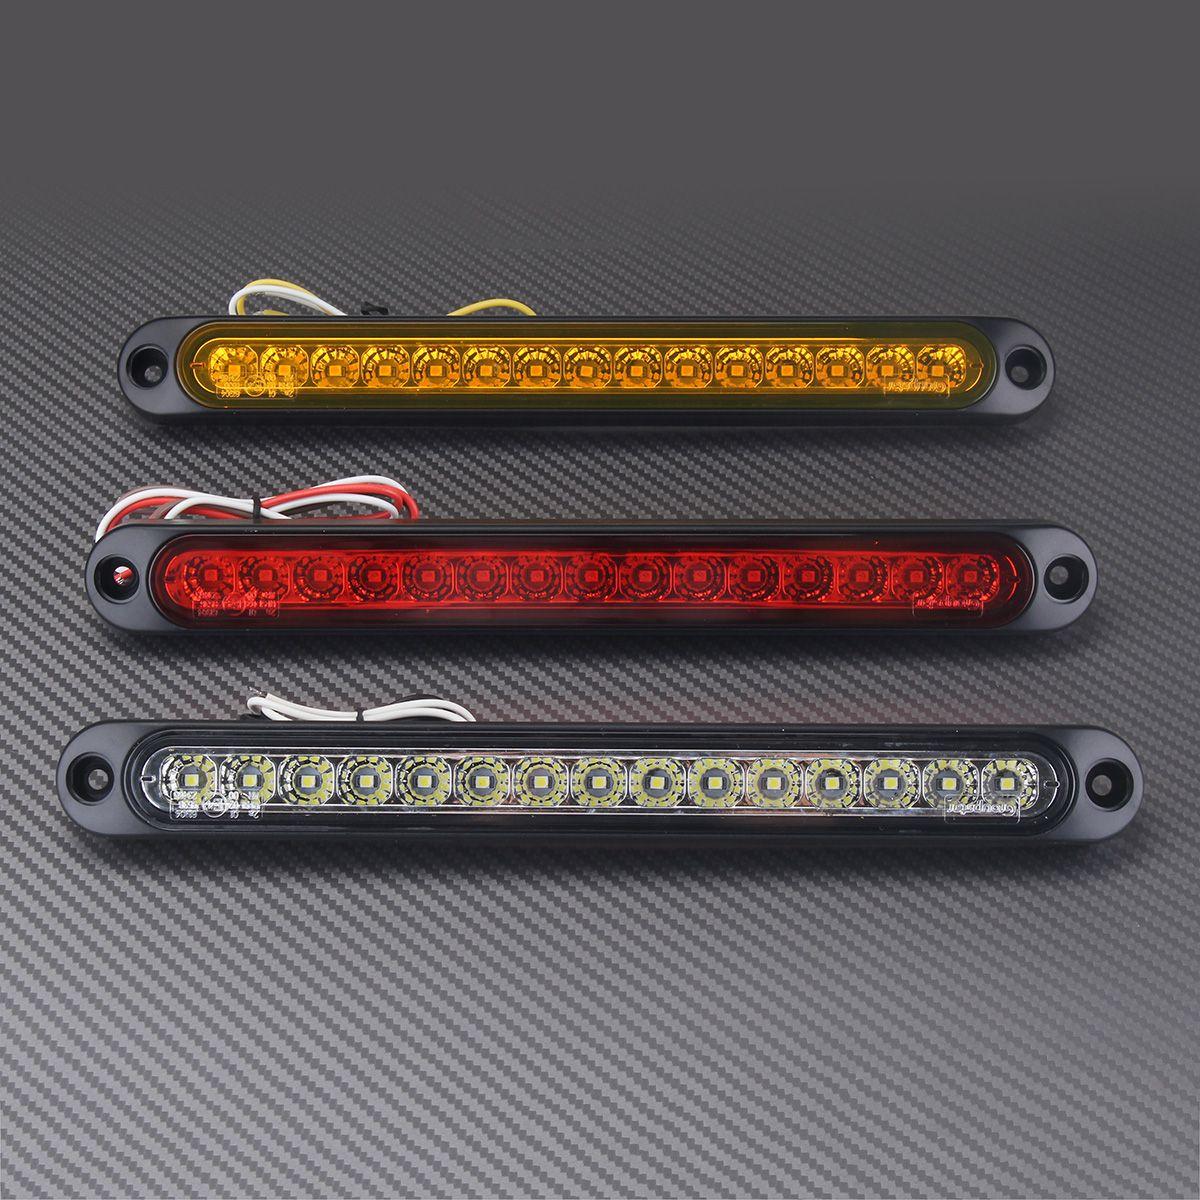 Dc10 30v Ultra Slim 15 Led Car Tail Light Stop Reverse Lamp About White 12v 36 Circuit Board Rv Boat Bulb Ba9s New For